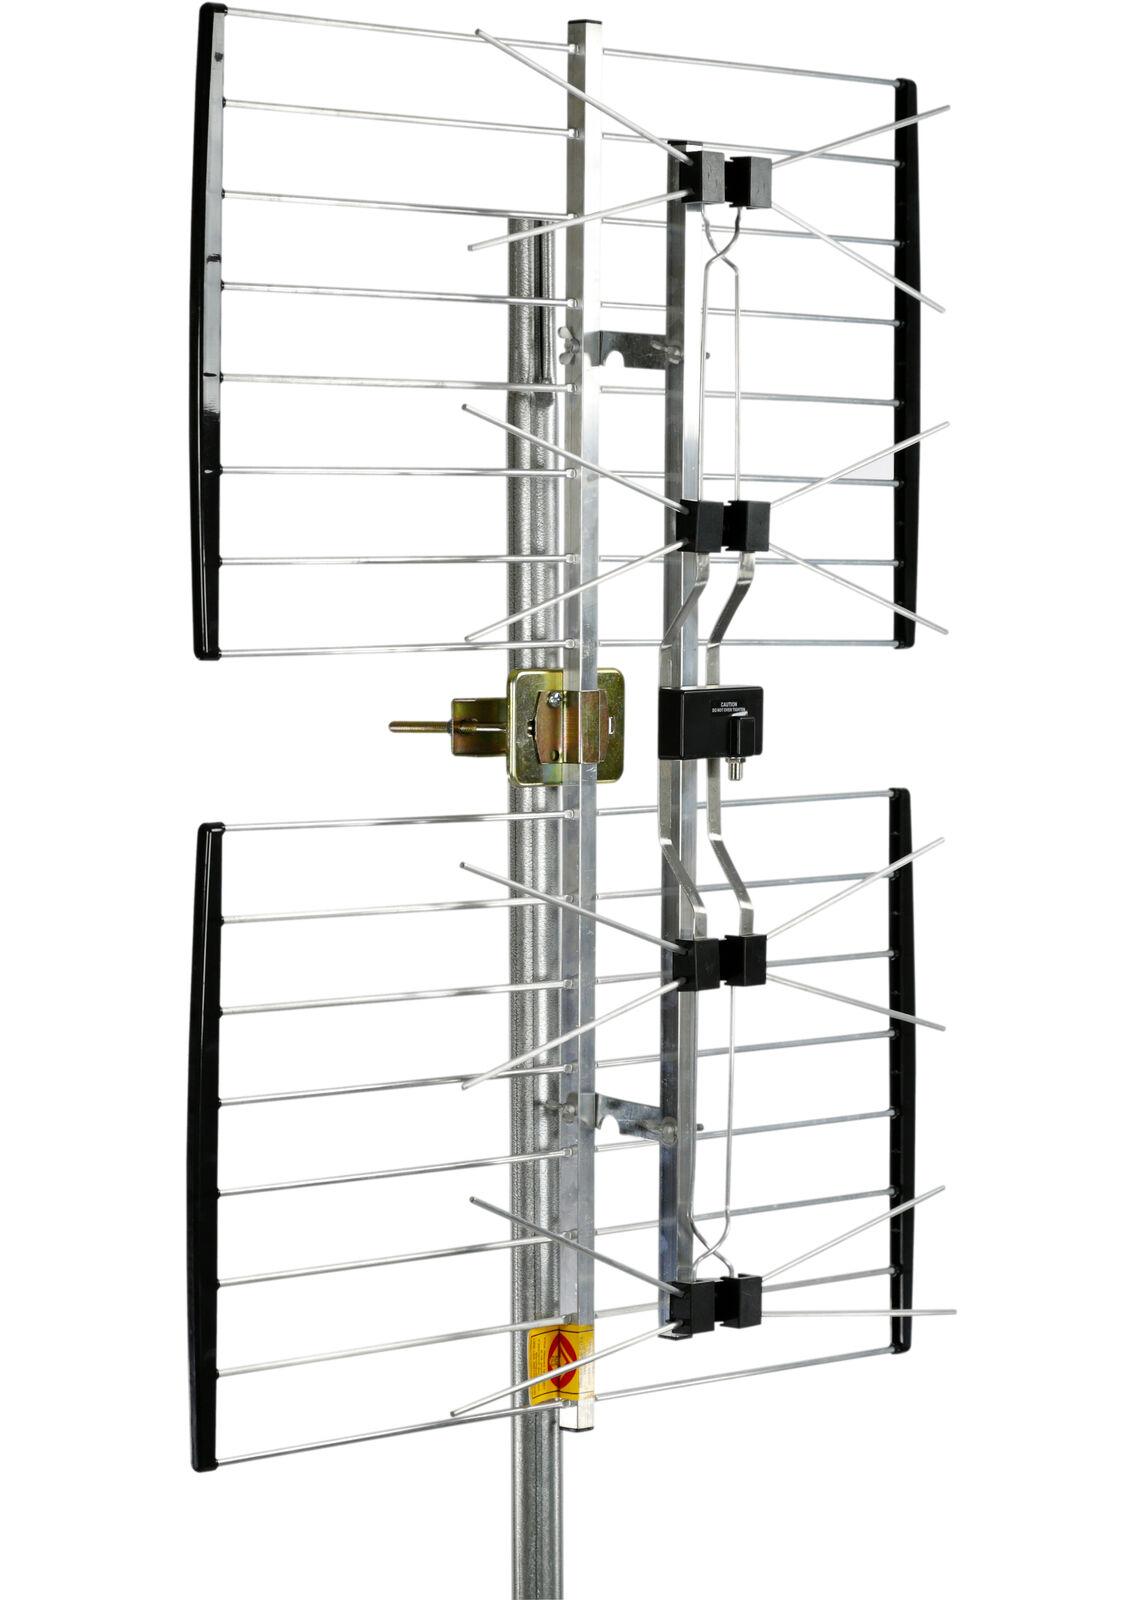 4221HD renleys Channel Master ULTRAtenna 60-Mile Range Outdoor Antenna